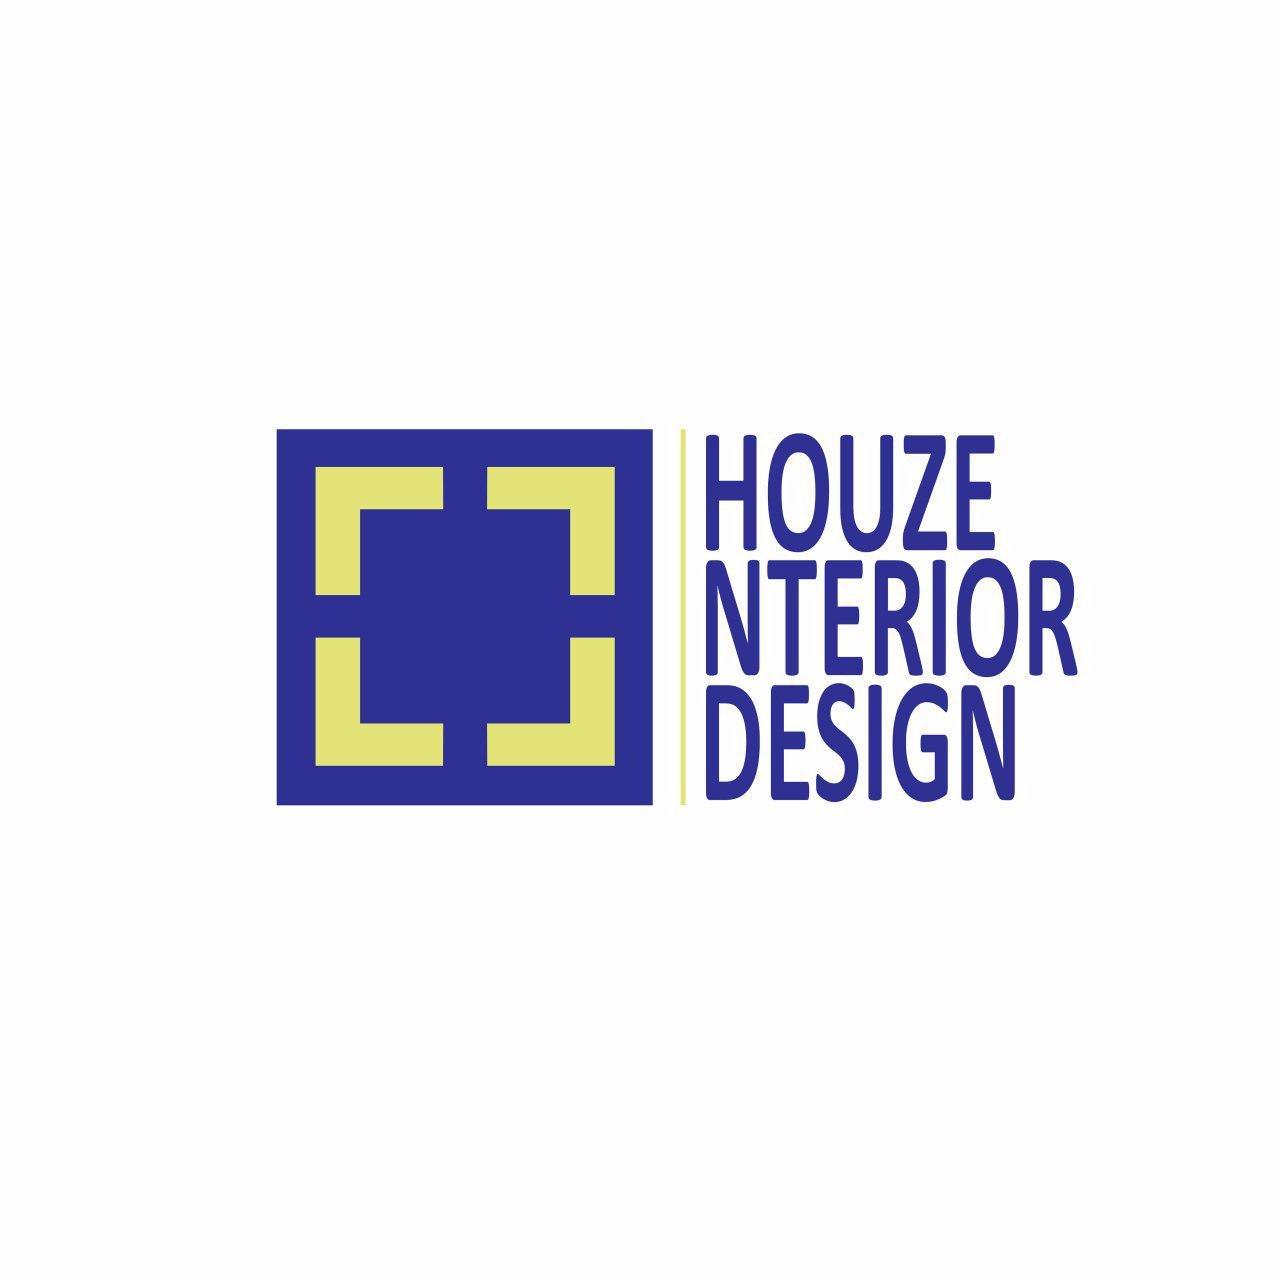 houze interiordesign on Twitter